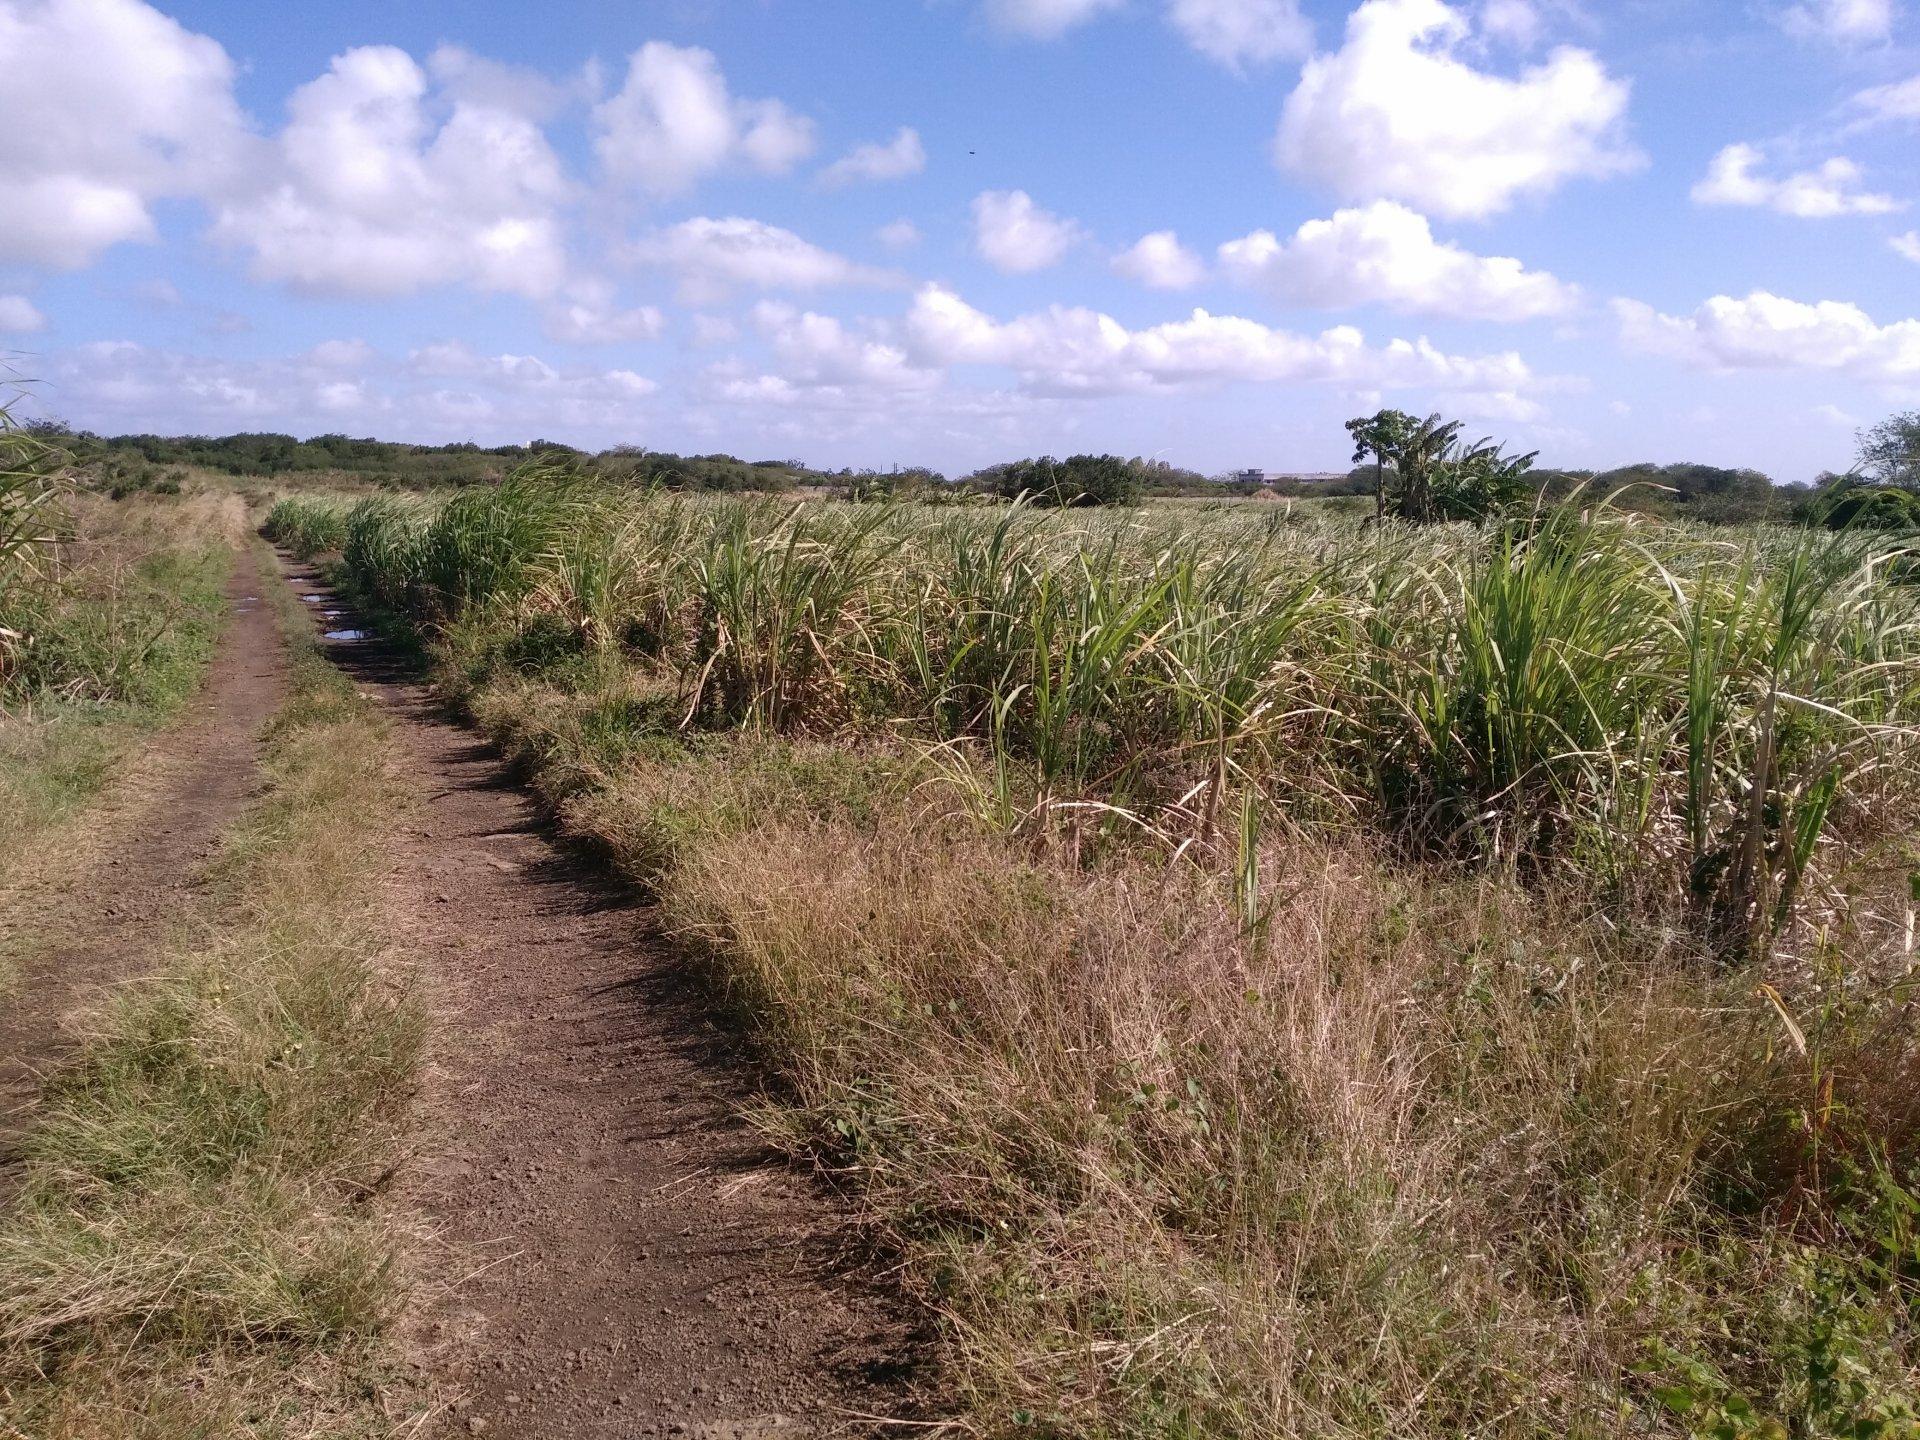 Beau terrain agricole plat